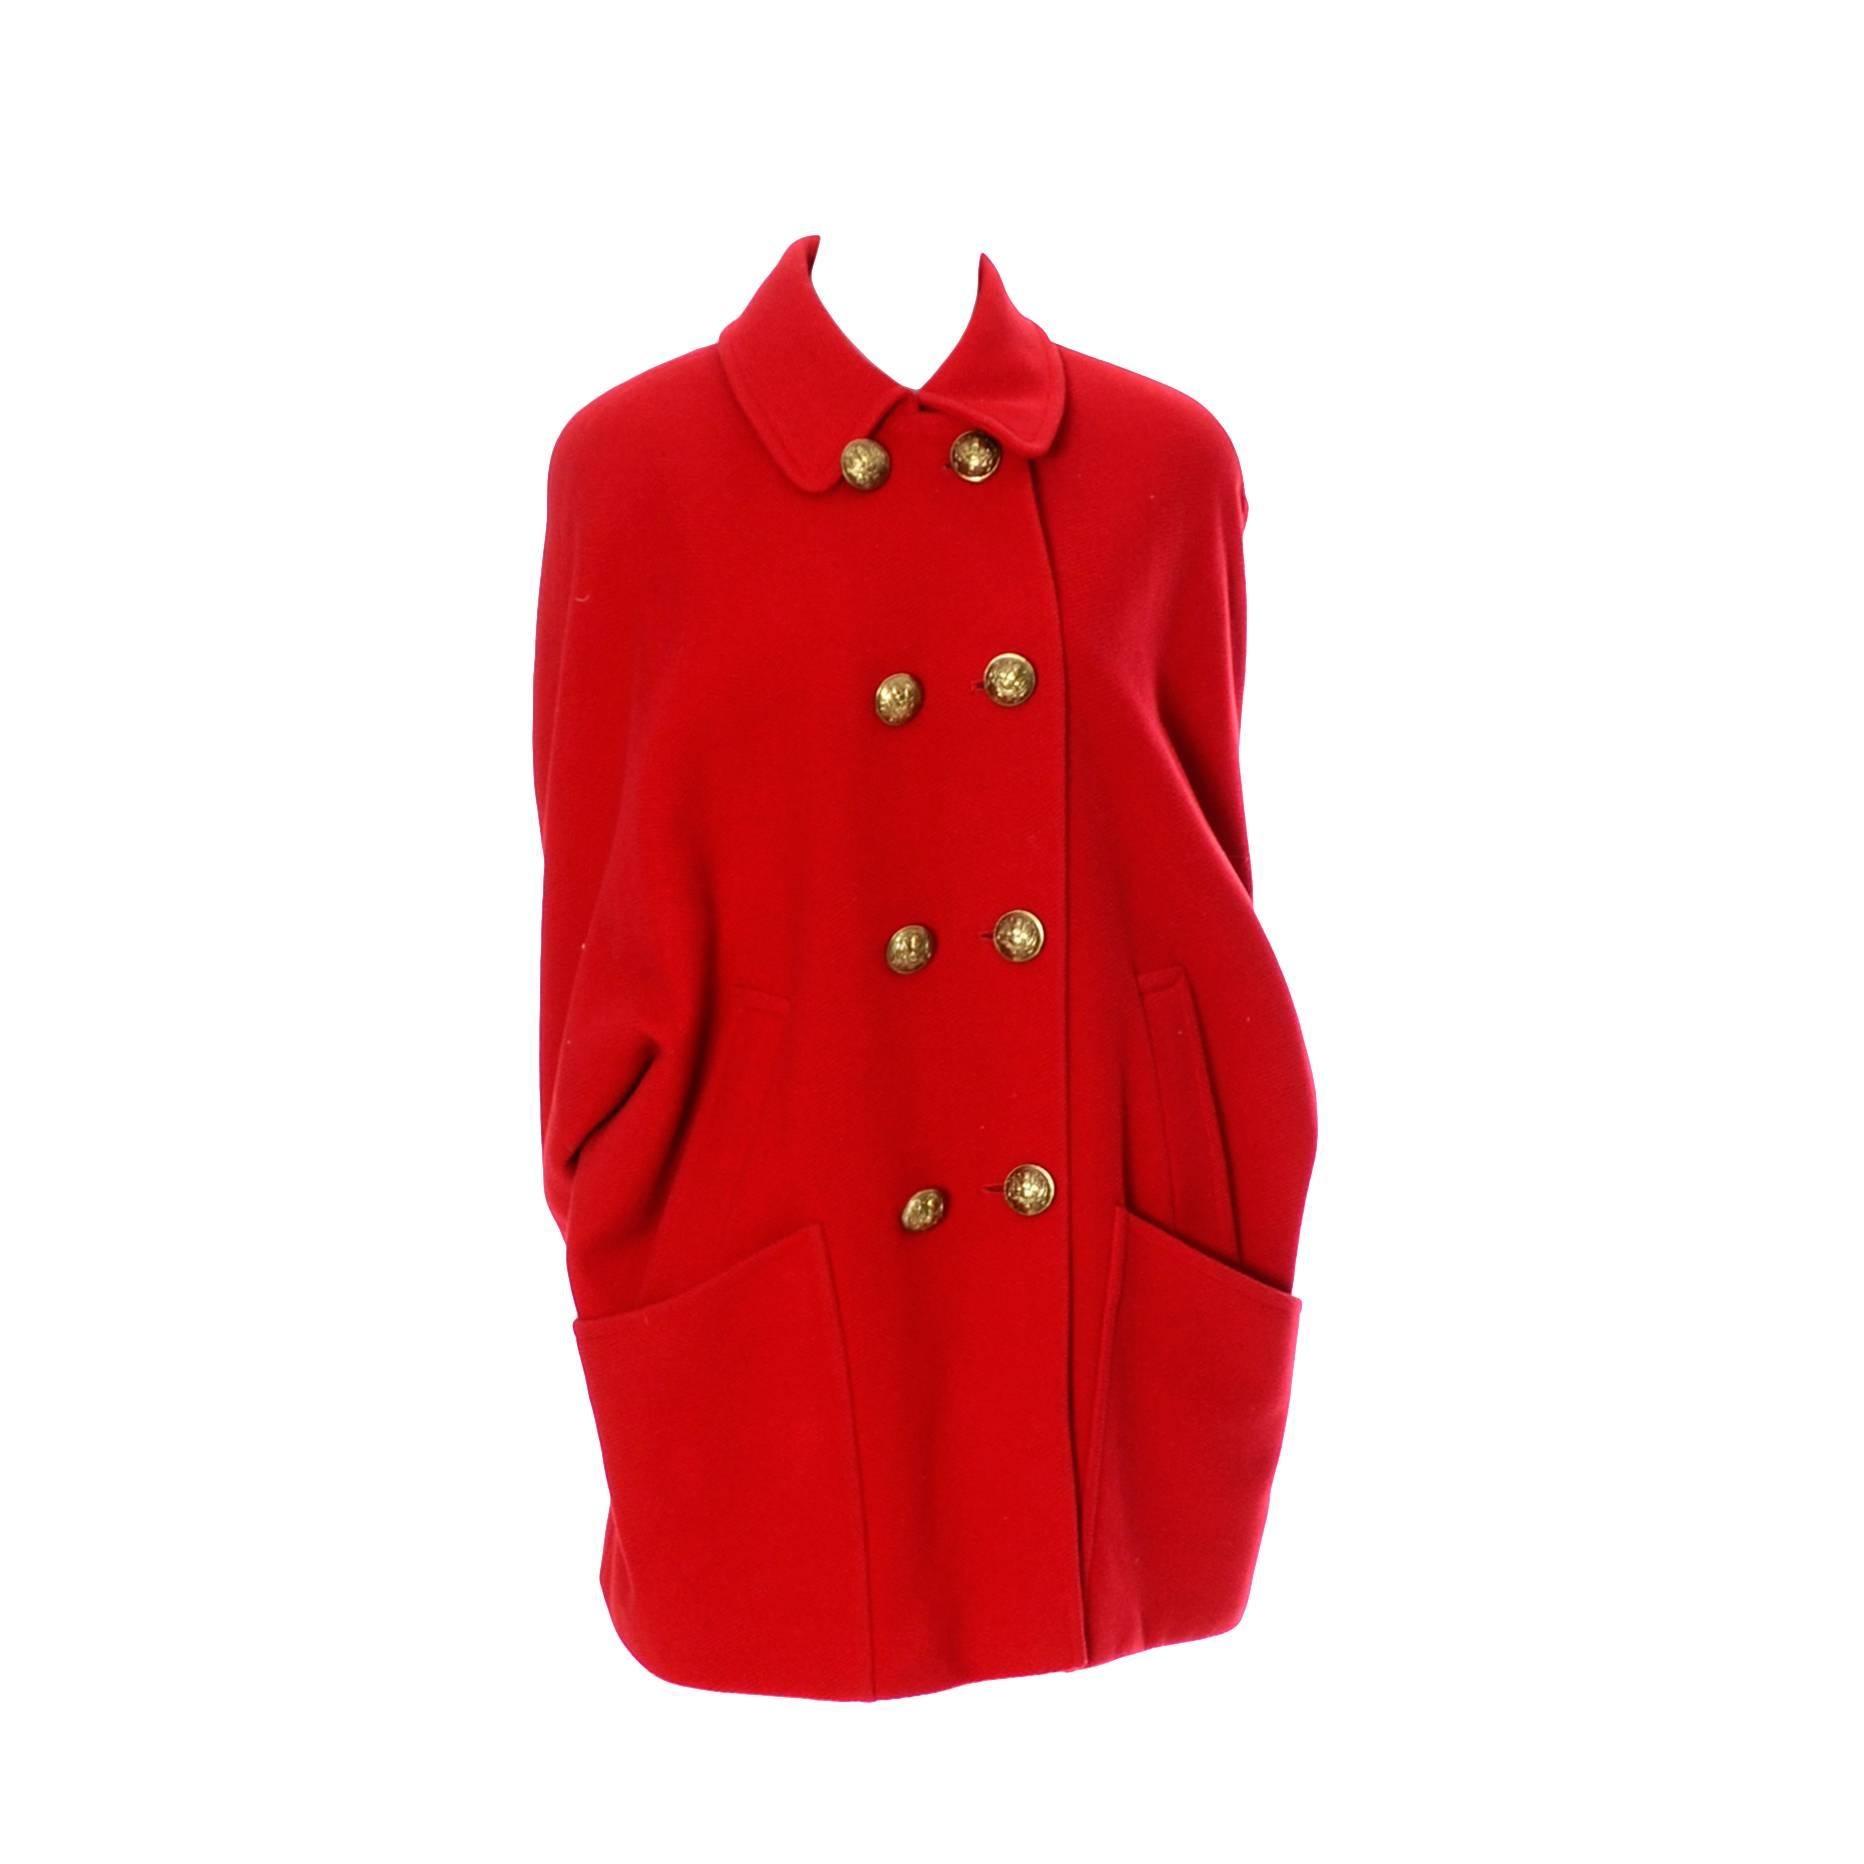 Guy Laroche Boutique 1980s Vintage Coat in Cherry Red Wool W Dolman Sleeves